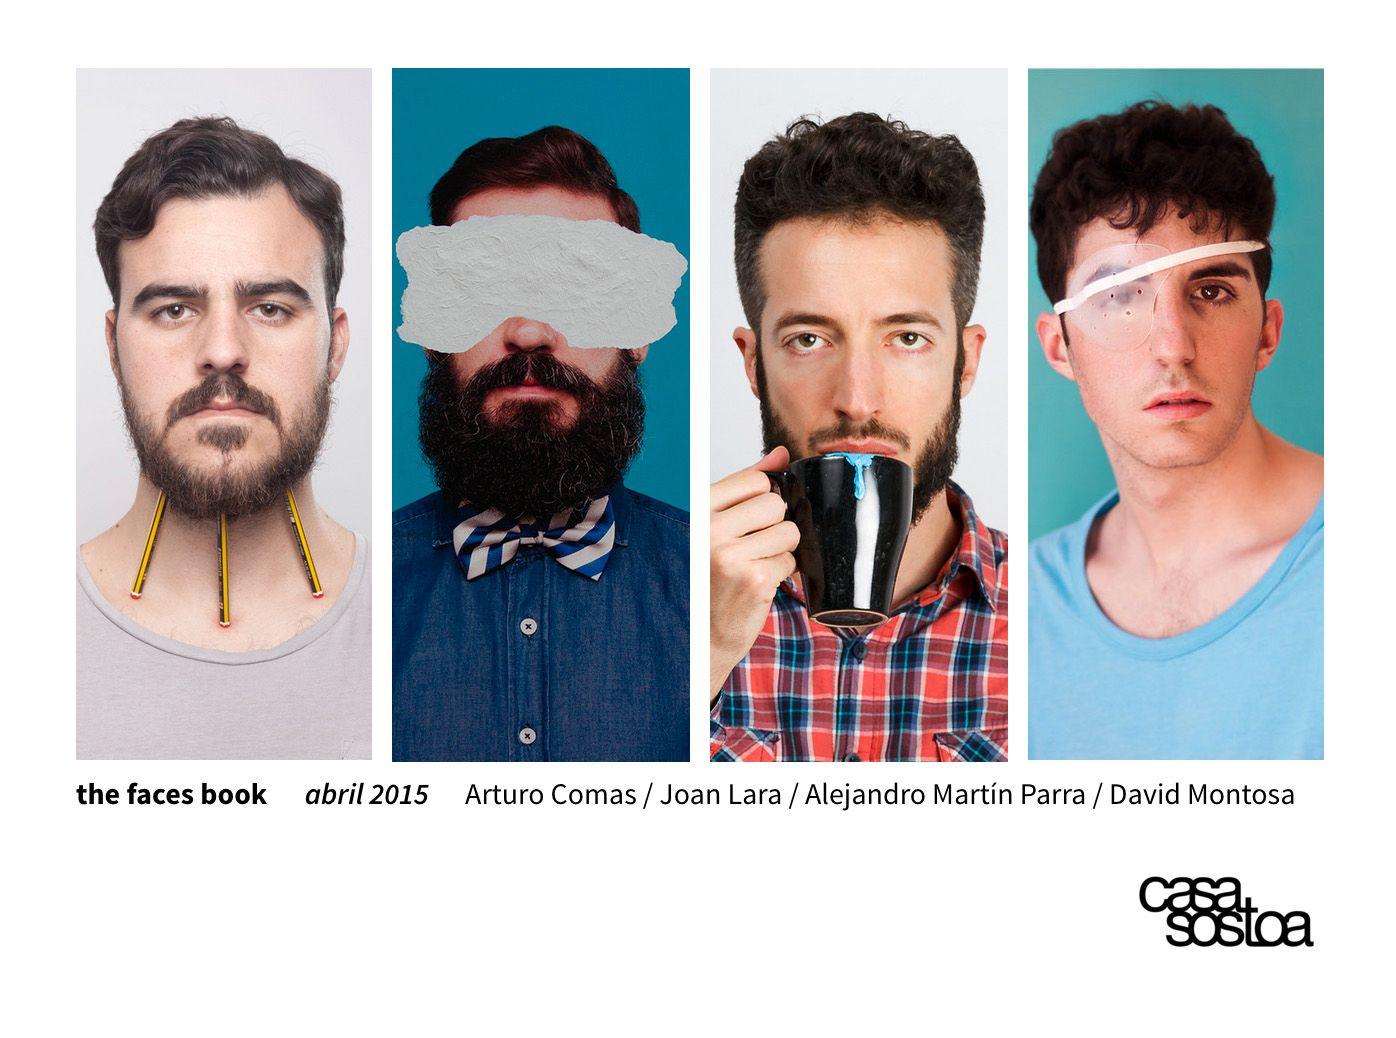 The faces book